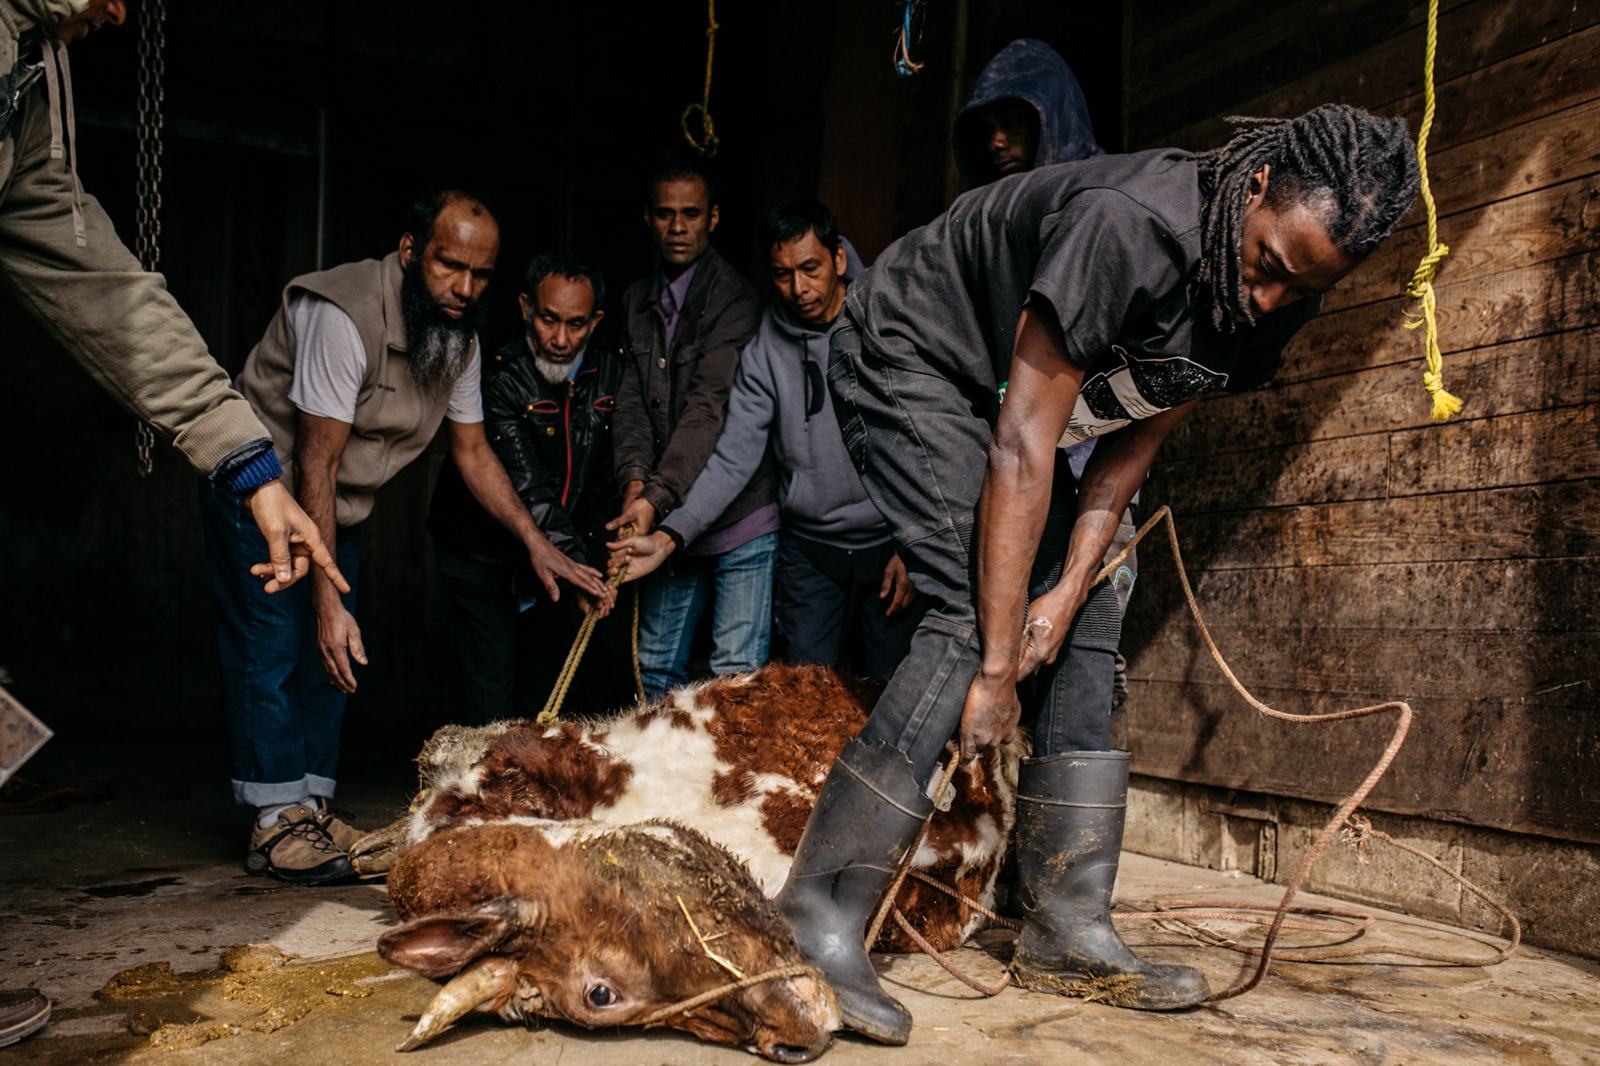 Art and Documentary Photography - Loading rohingya-lapetina-11.jpg